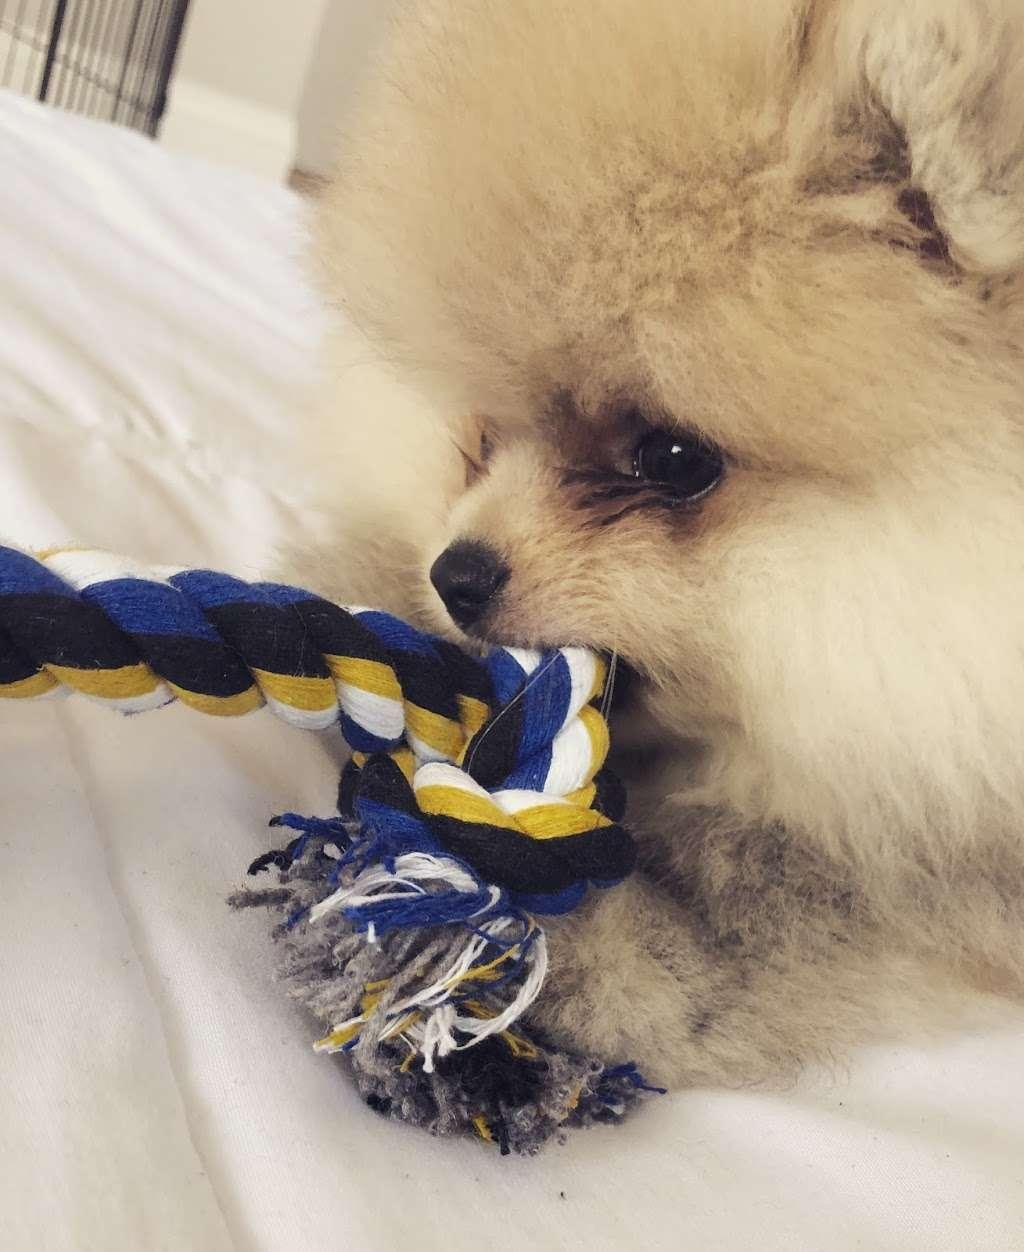 Pomeranian Puppies, Boutique - pet store  | Photo 8 of 10 | Address: Houston, TX, USA | Phone: (650) 303-1599